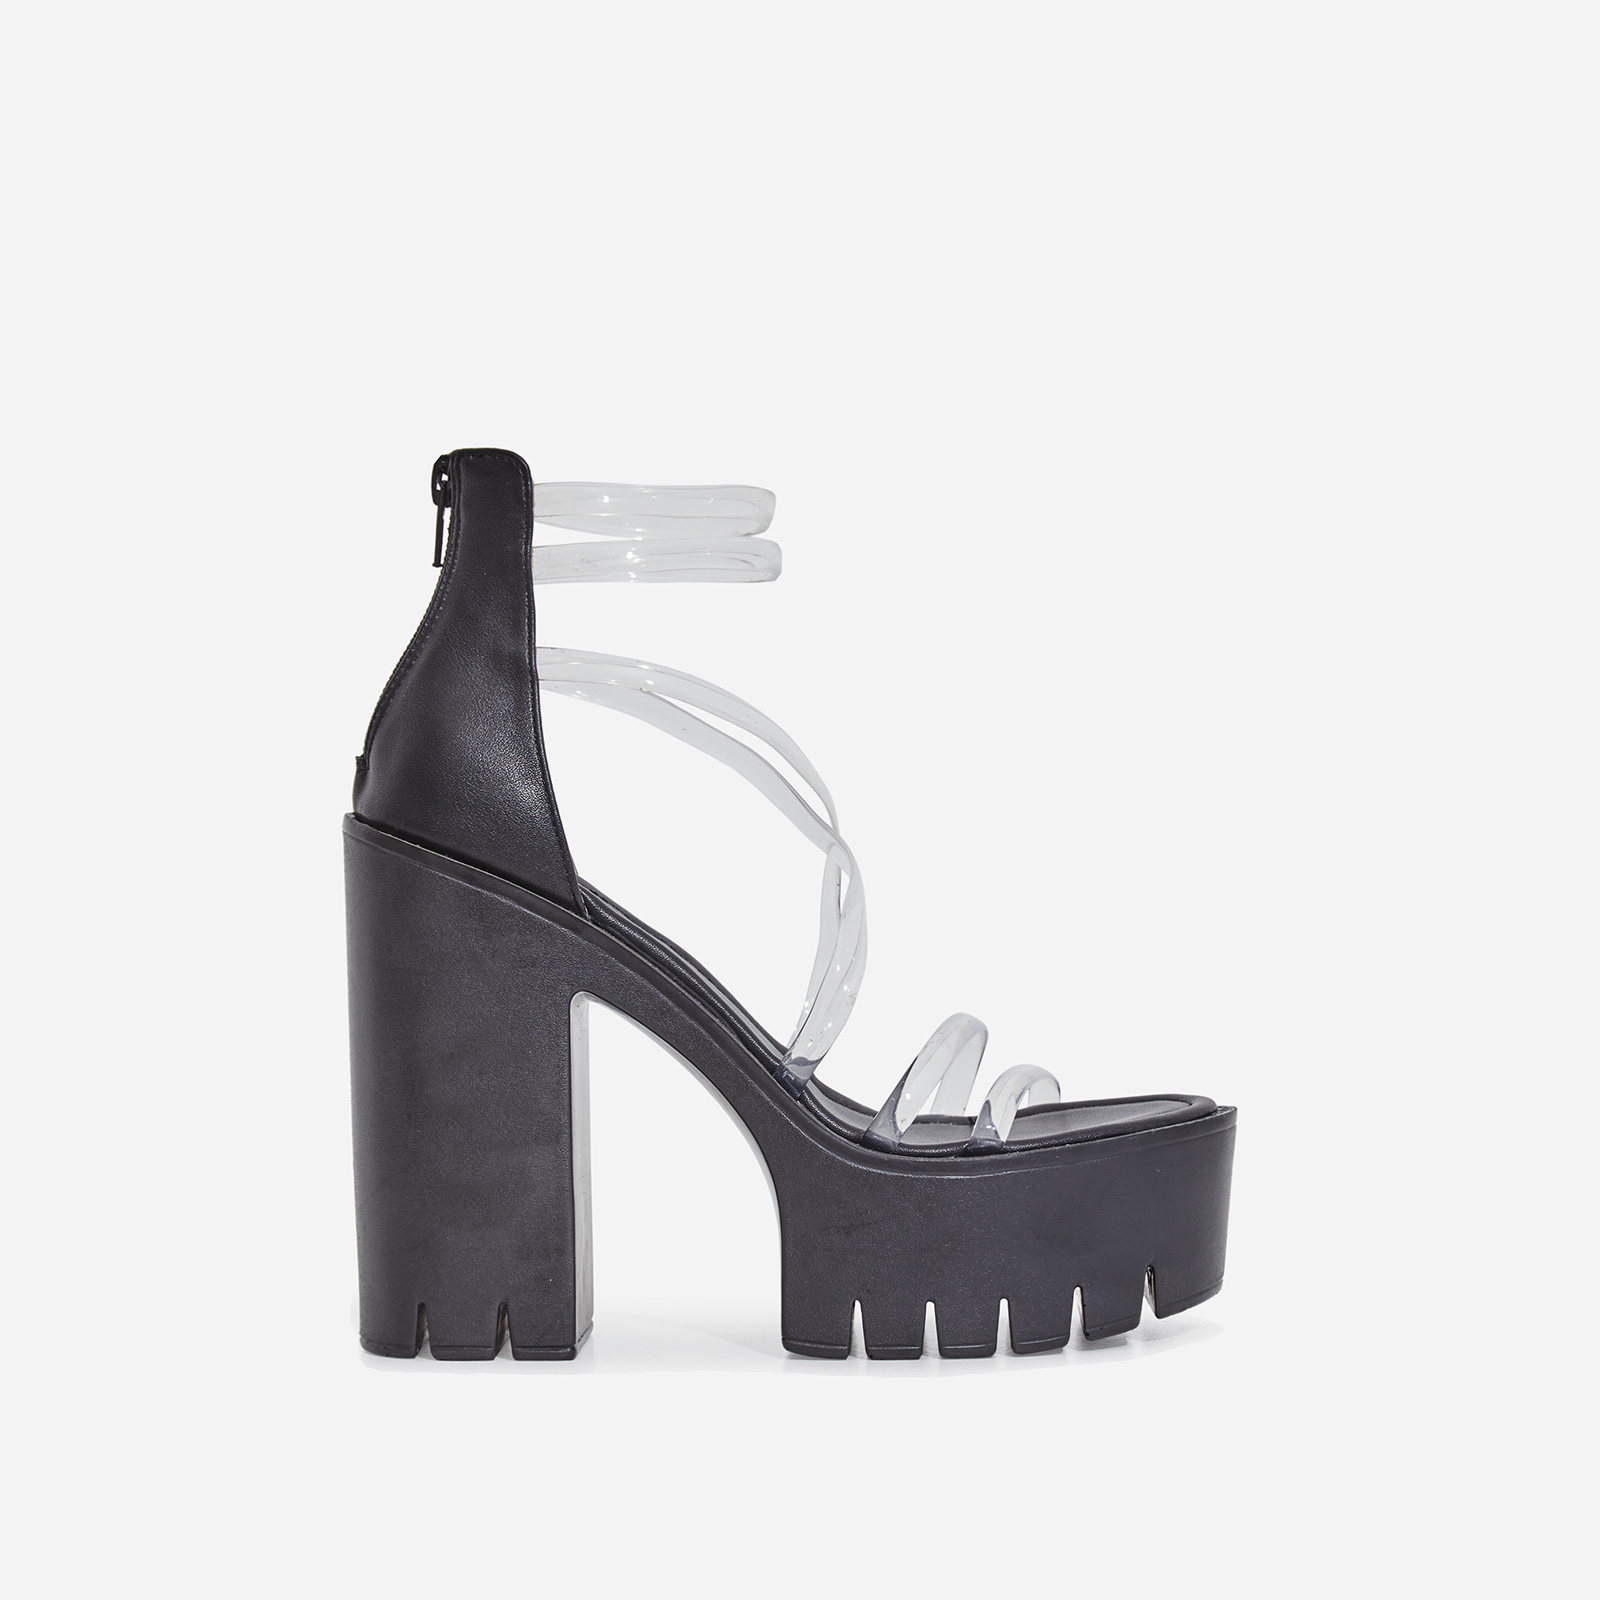 Shiloh Perspex Platform Block Heel In Black Faux Leather